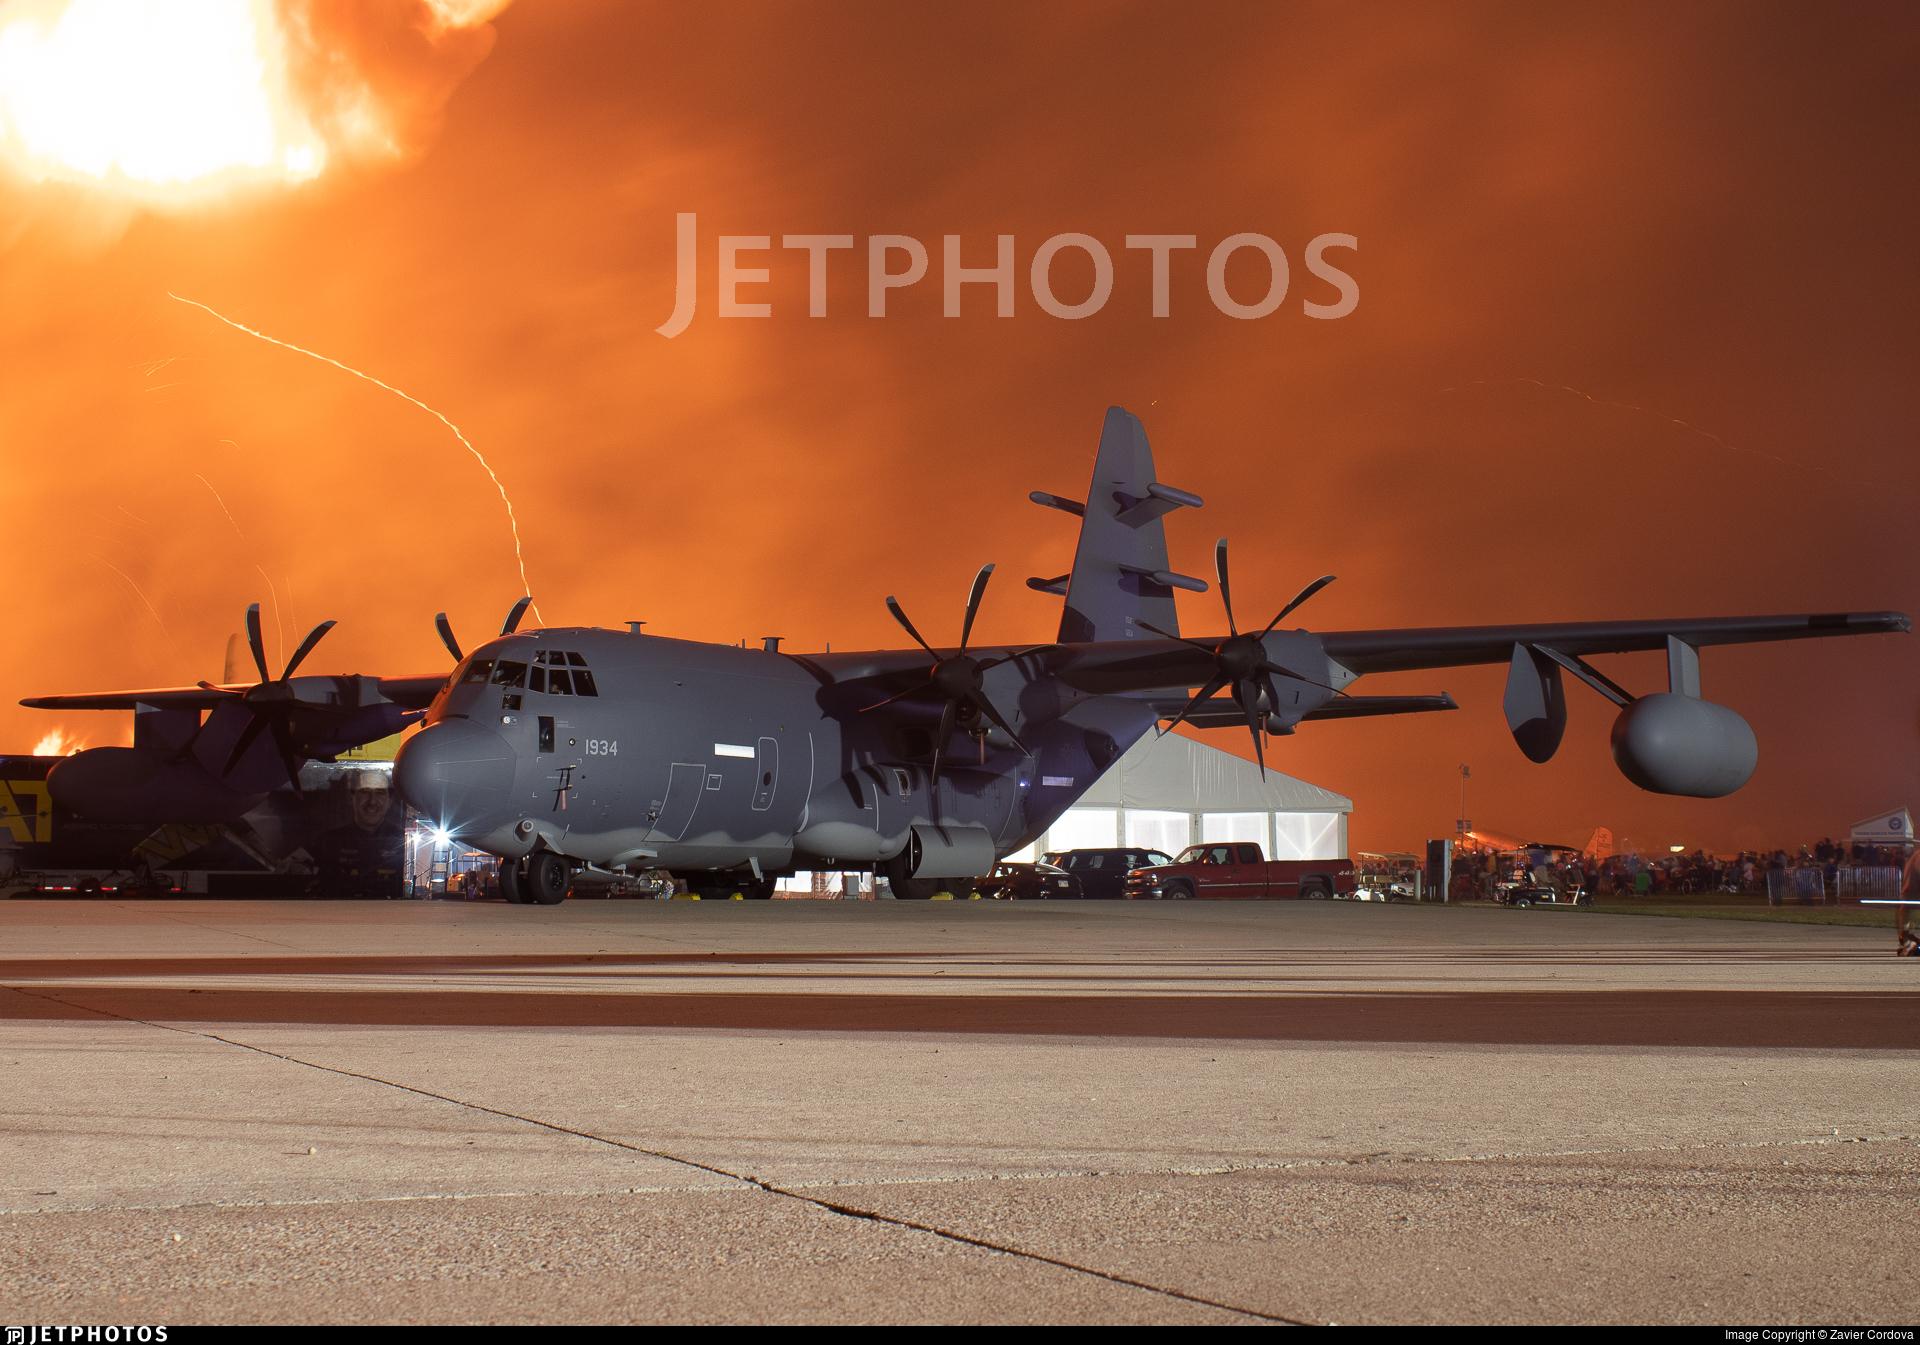 00-1934 - Lockheed Martin EC-130J Commando Solo - United States - US Air Force (USAF)